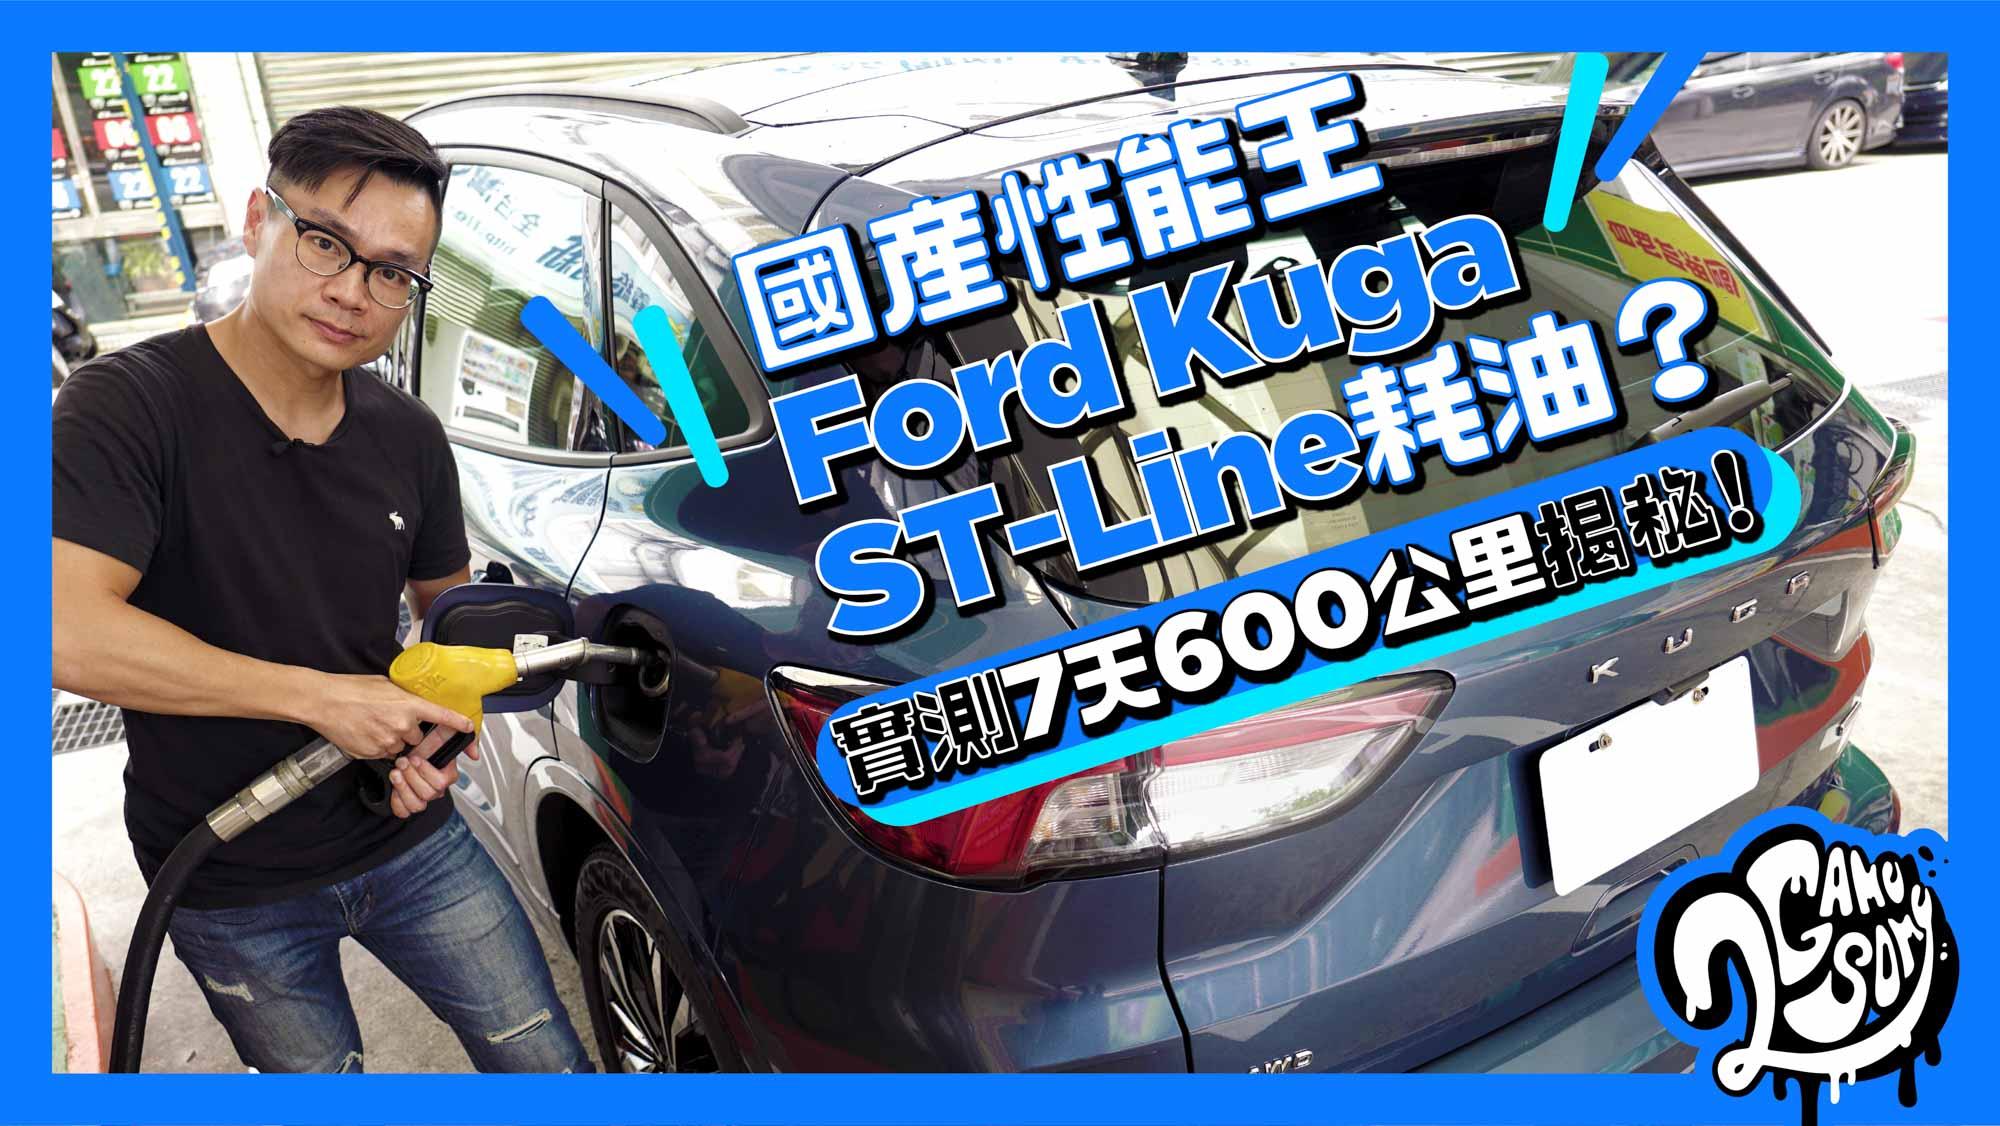 國產性能王 Ford Kuga EcoBoost 250 AWD ST-Line 耗油嗎?實測 7天 / 600公里揭秘!⛽